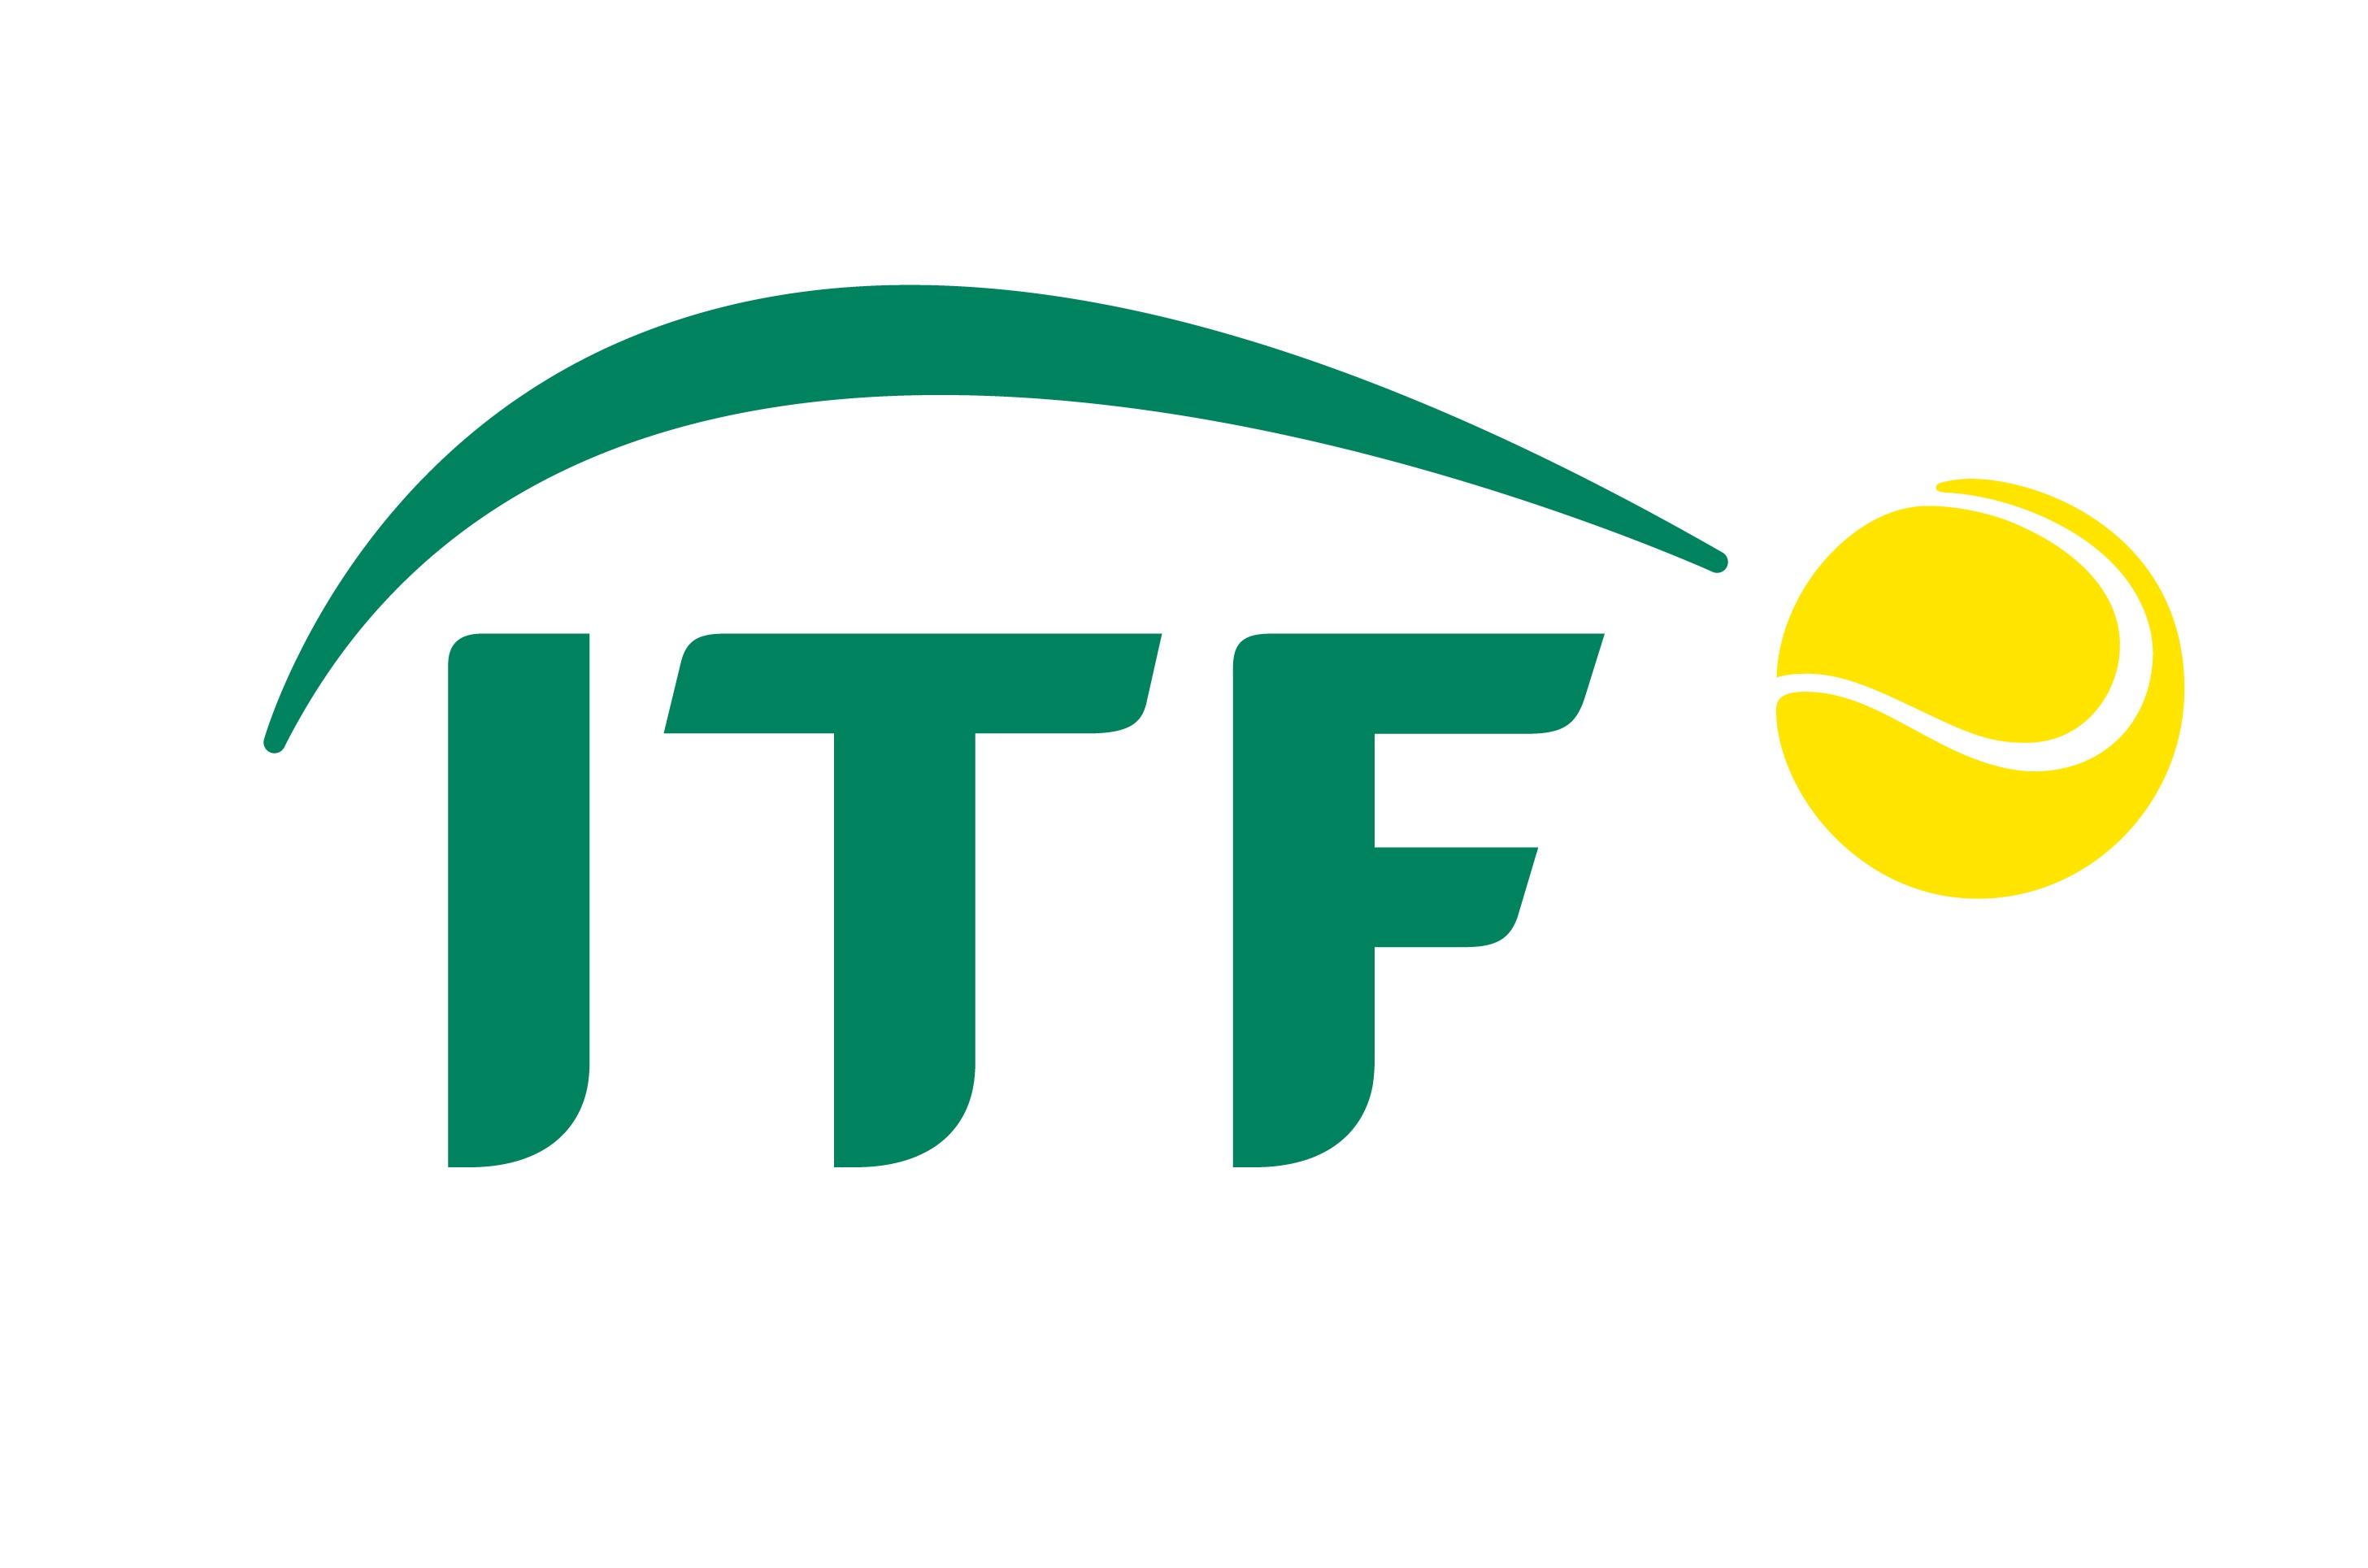 Apuesta ITF EEUU F2: Eric Quigley vs Yannick Hanfmann @CFtenispicks